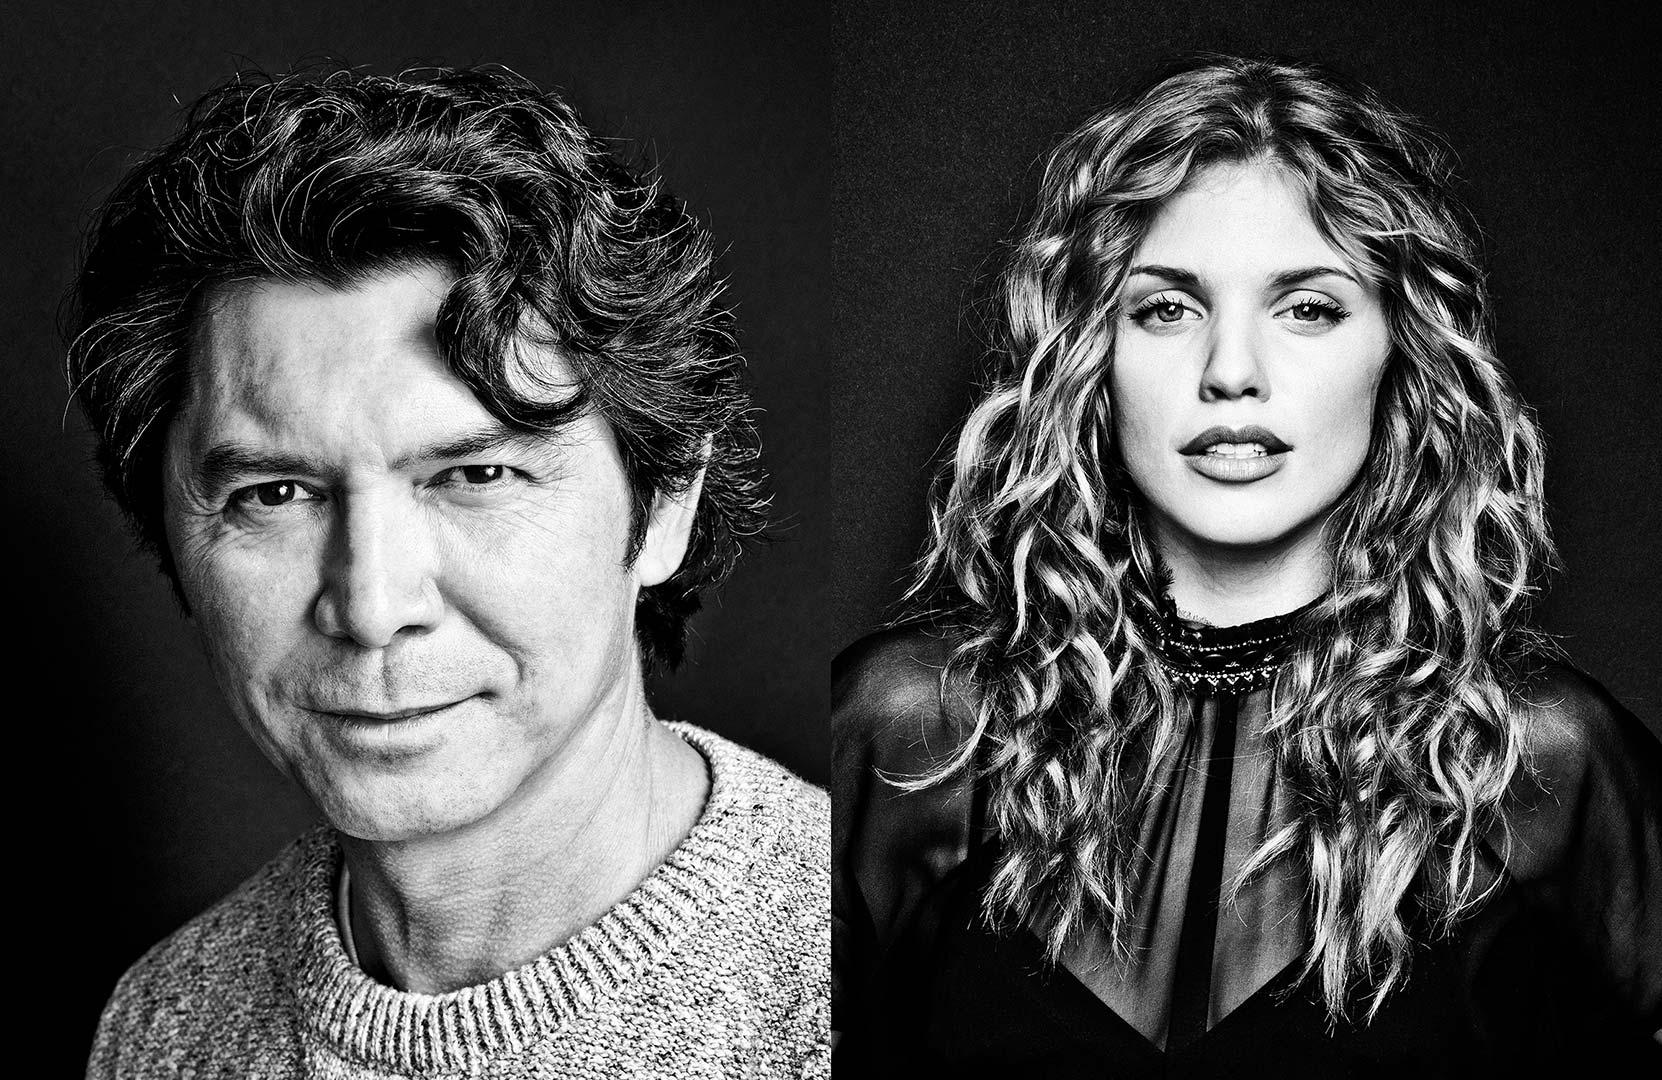 black & white portraits of actors Lou Diamond Phillips and Annalynne McCord